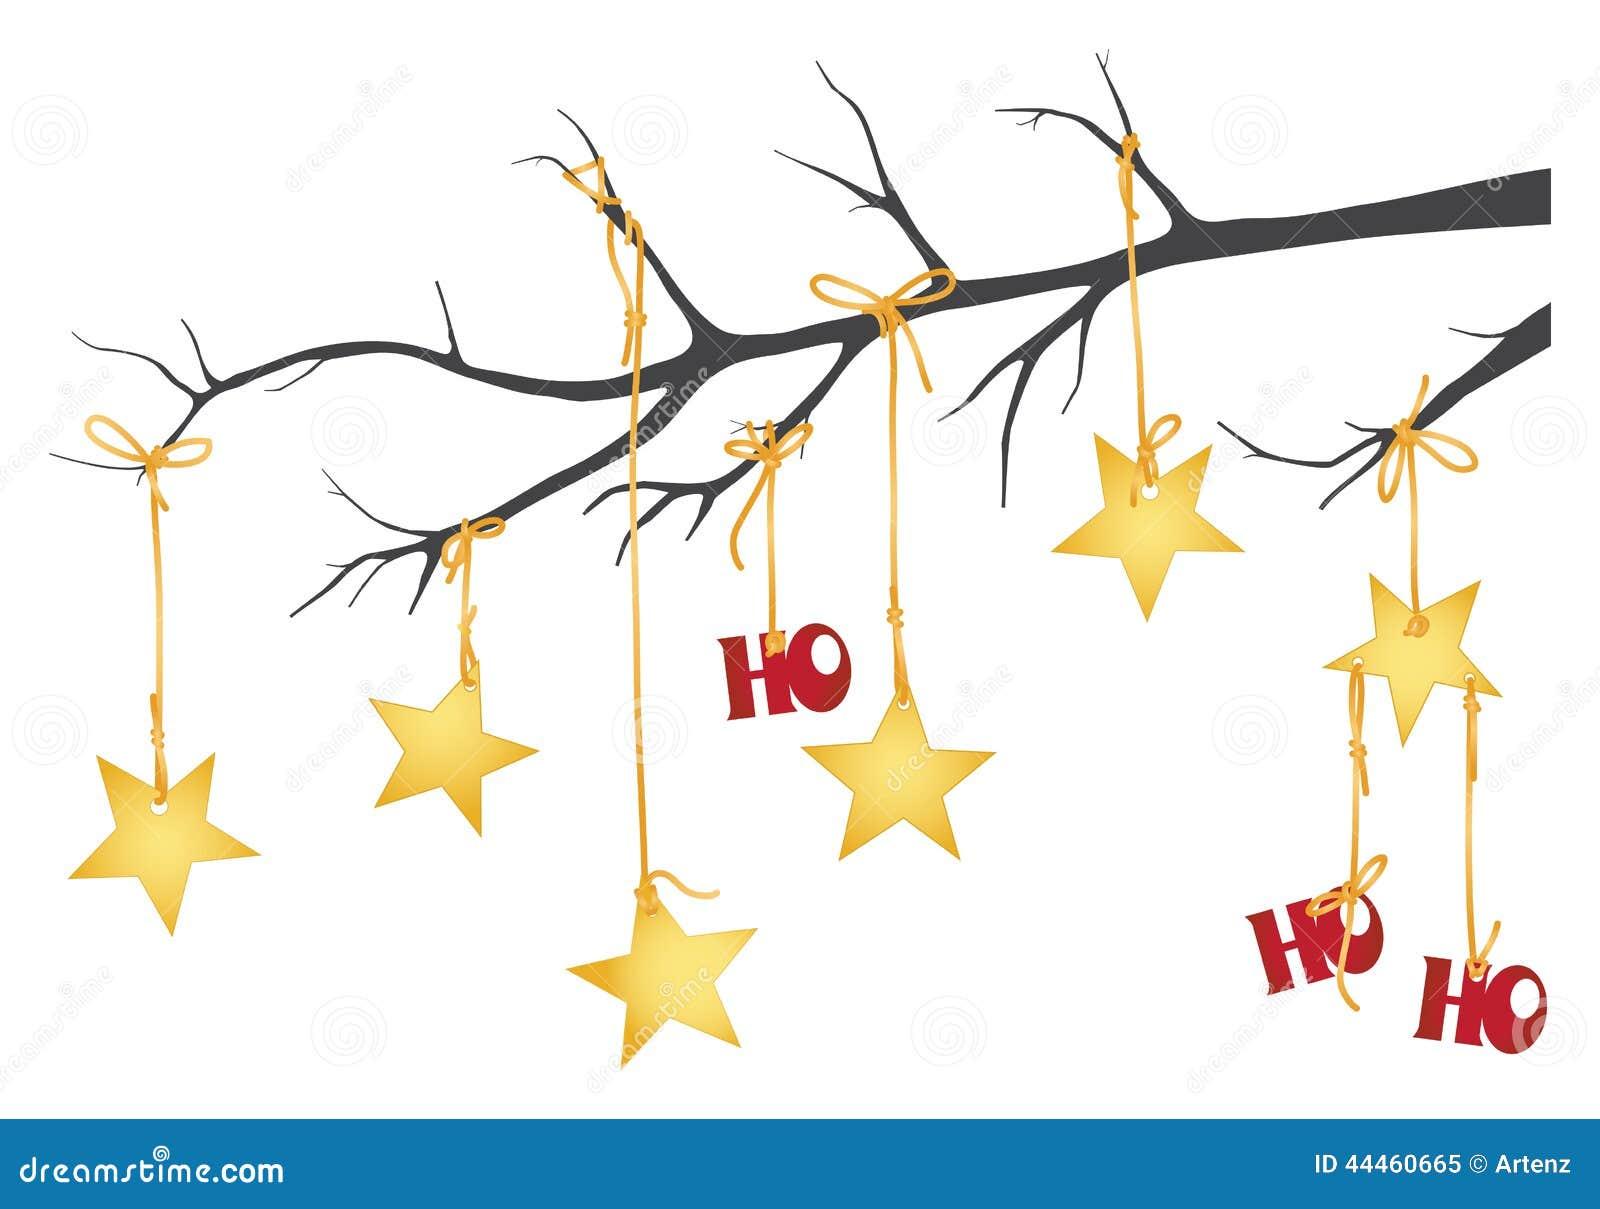 Hanging Tree Branch Decor